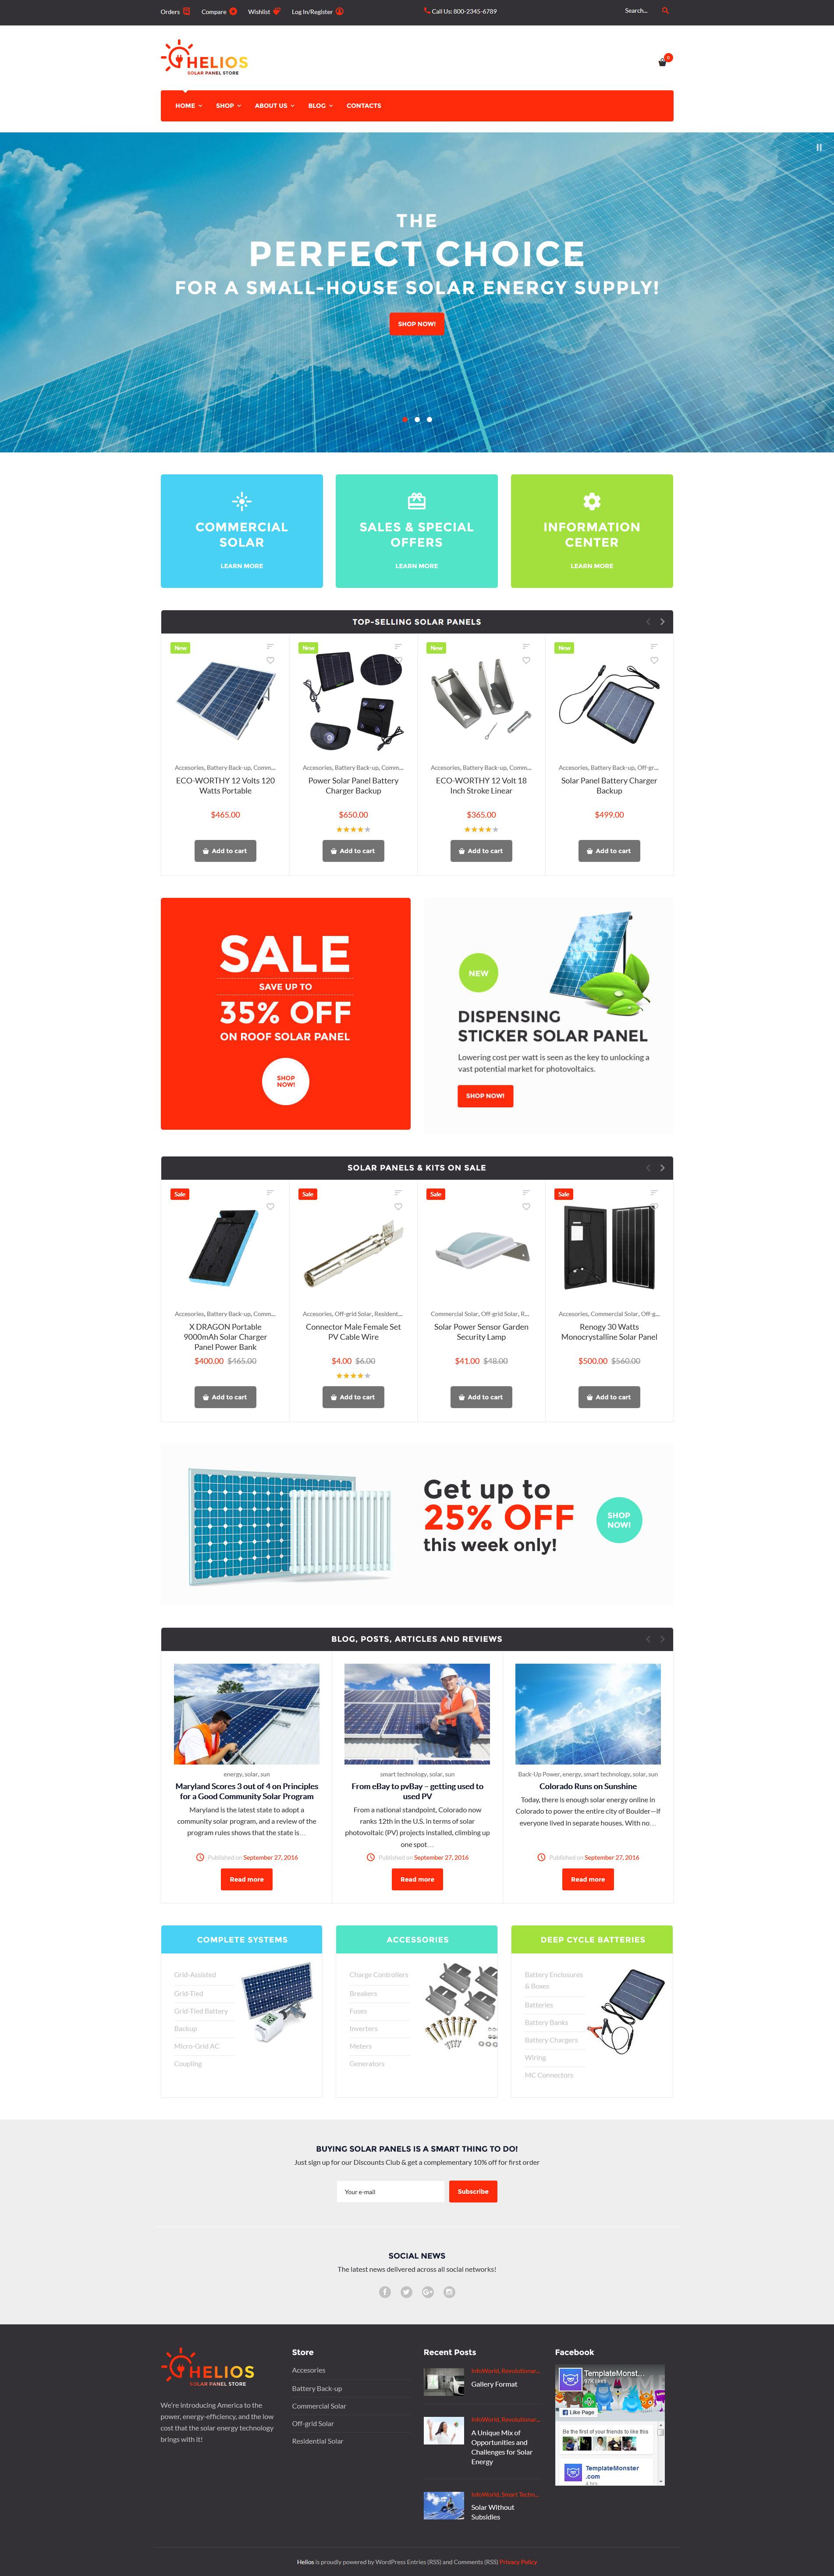 """Helios - Solar Panels and Accessories Store"" - адаптивний WooCommerce шаблон №59040"